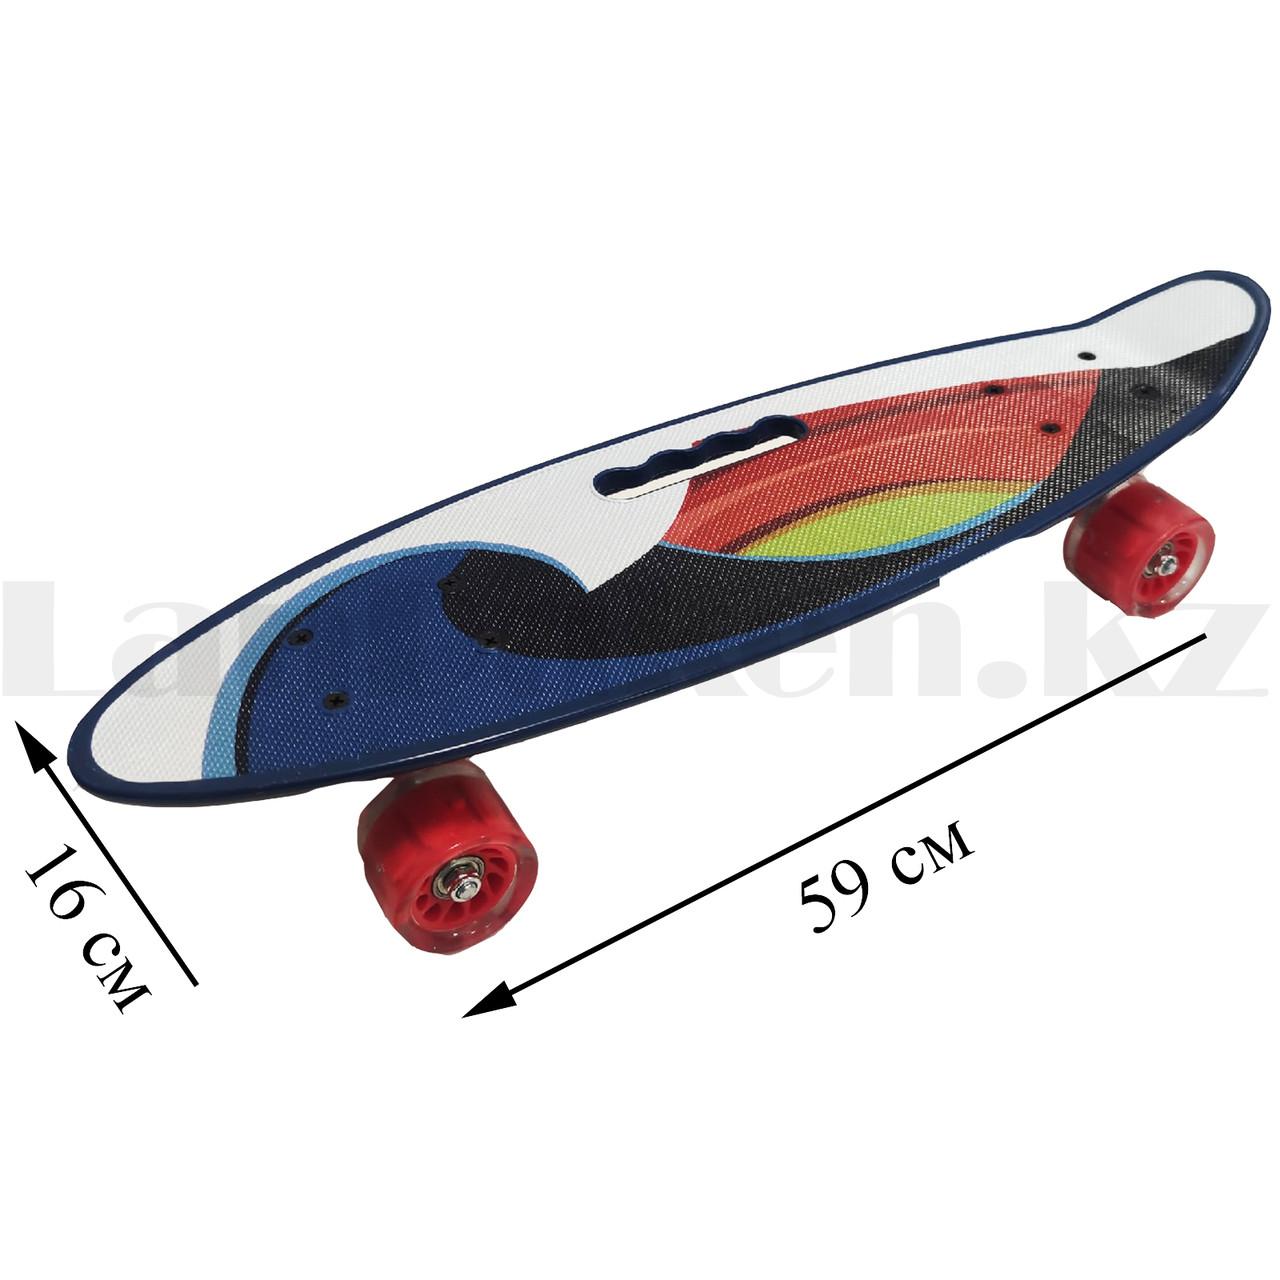 Лонгборд 59*16 Street Hit Волна с ручкой и со светящимися колесами (пенни борд) синий - фото 2